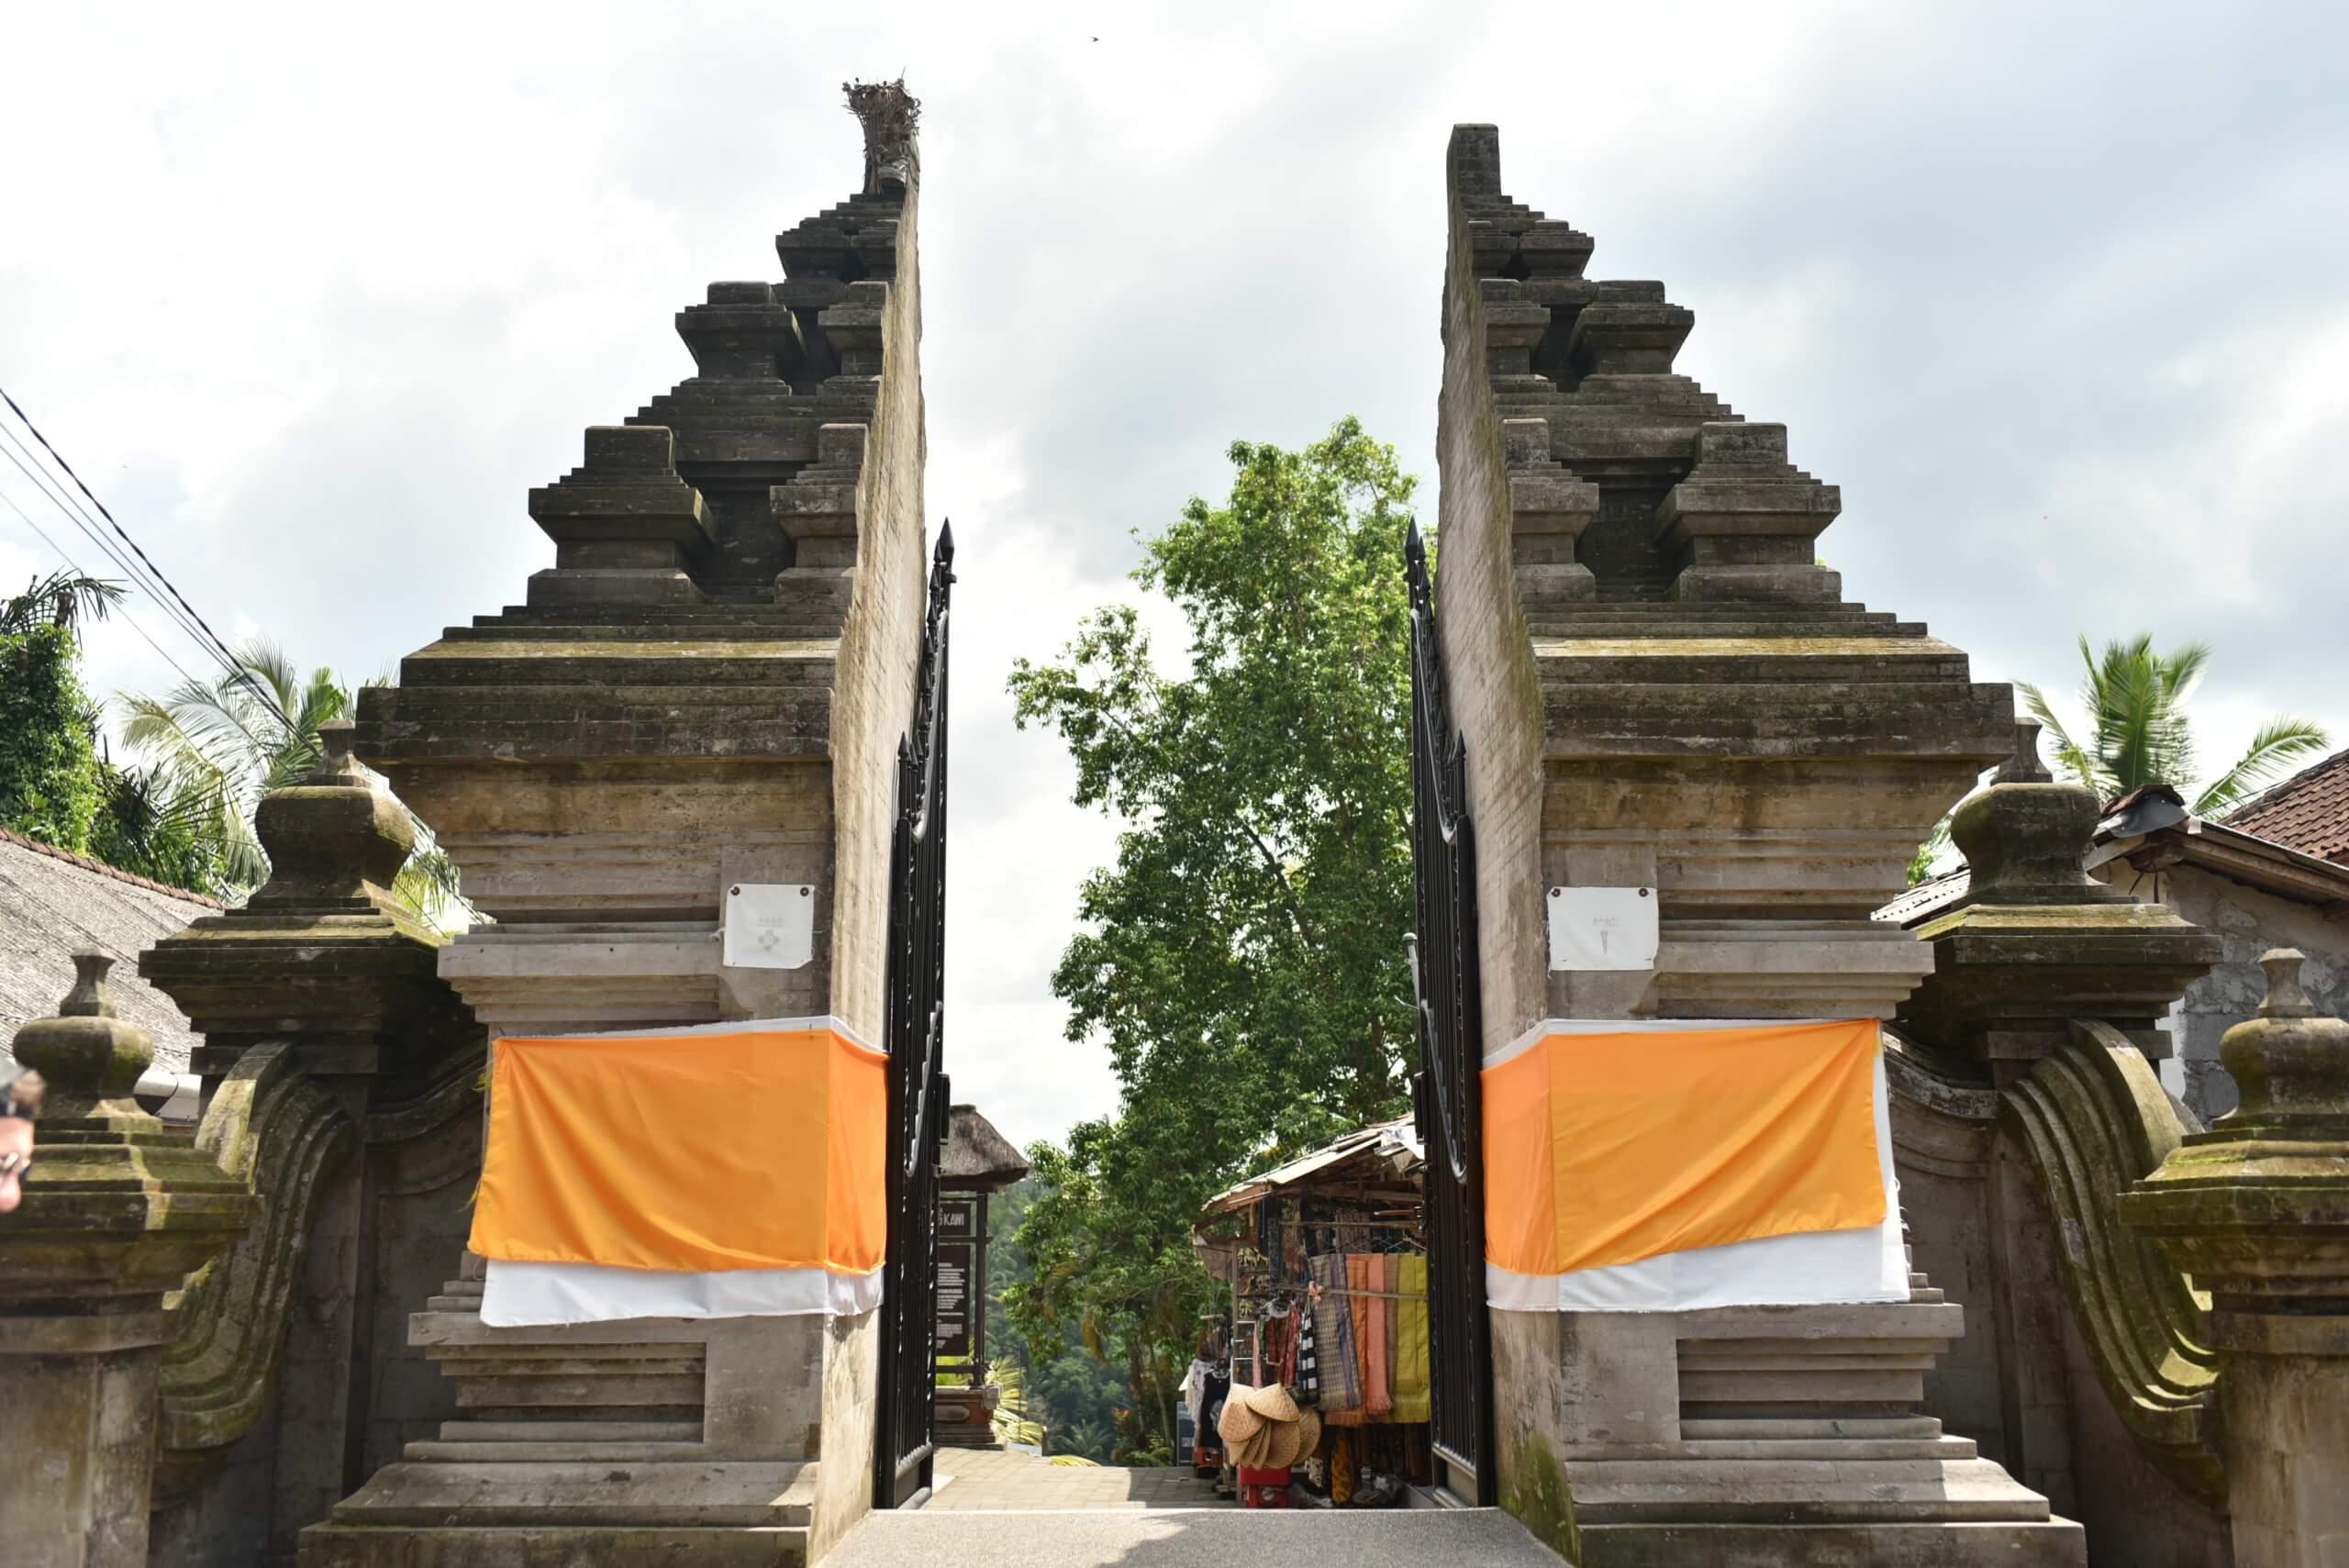 Les portes du temple -Gunung-Kawi